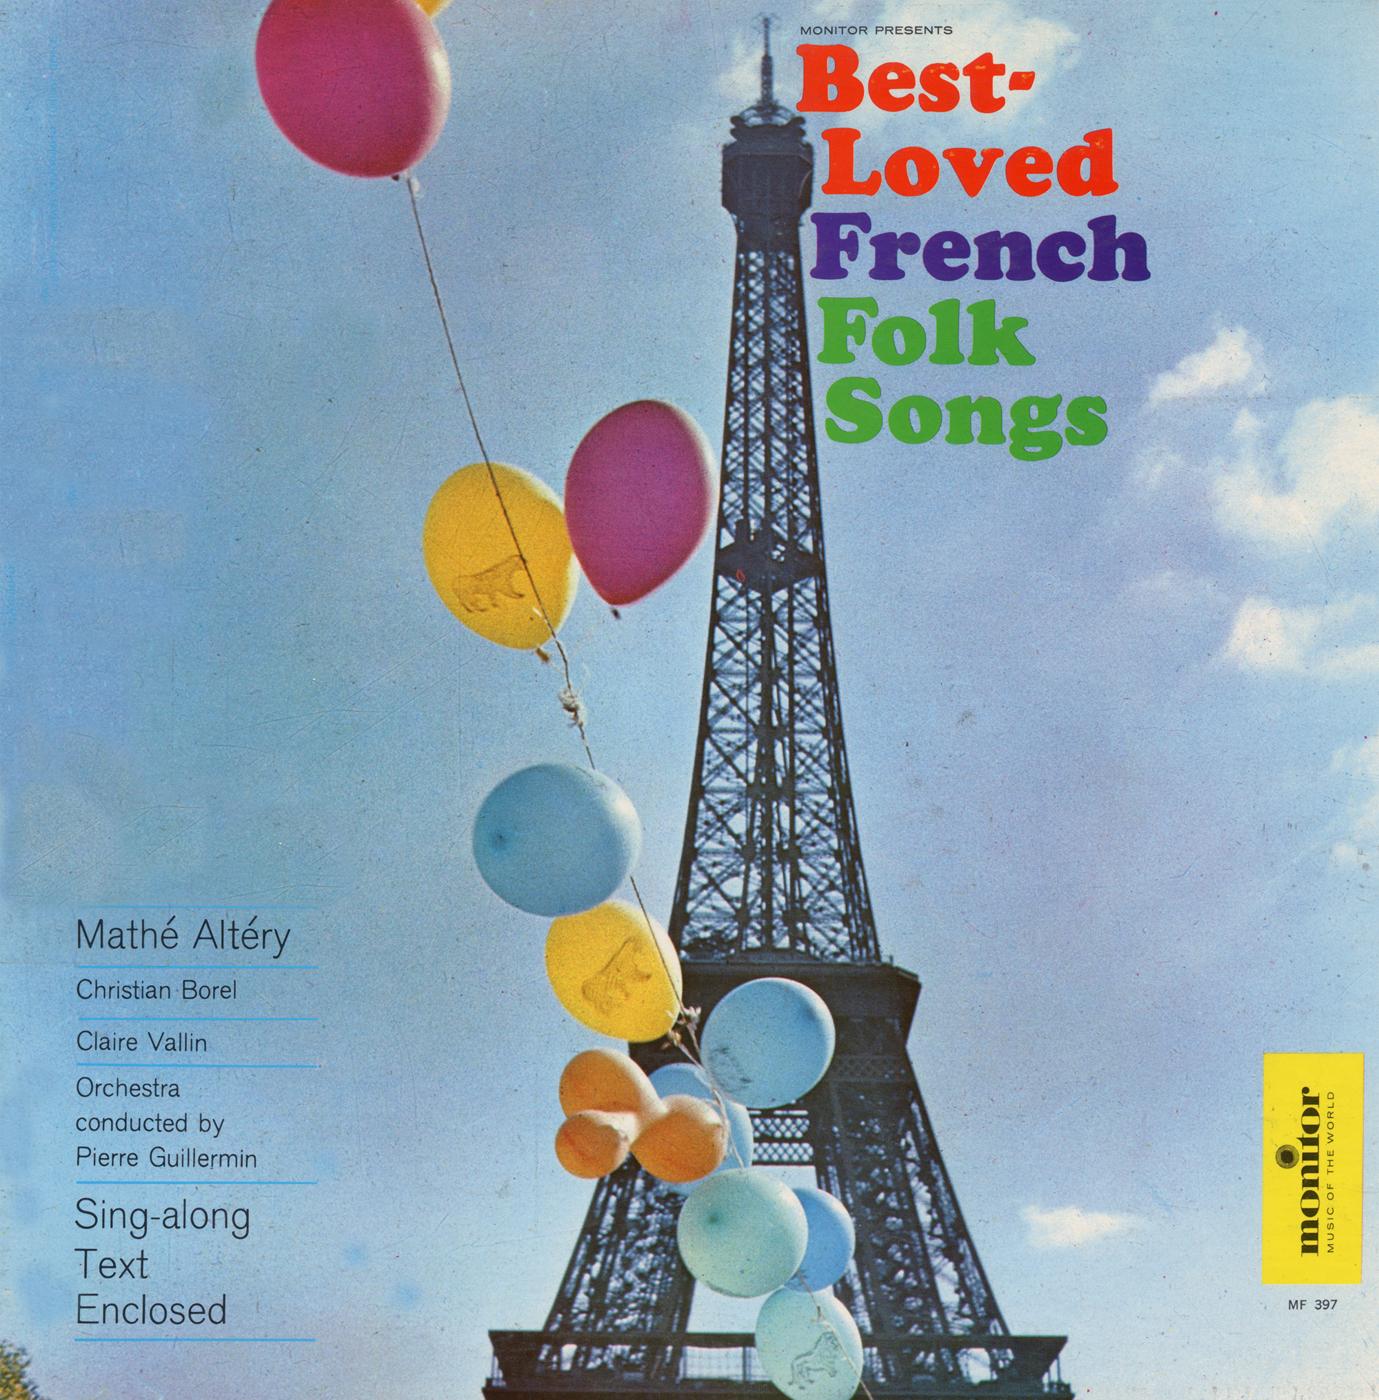 24 Best-Loved French Folk Songs   Smithsonian Folkways Recordings